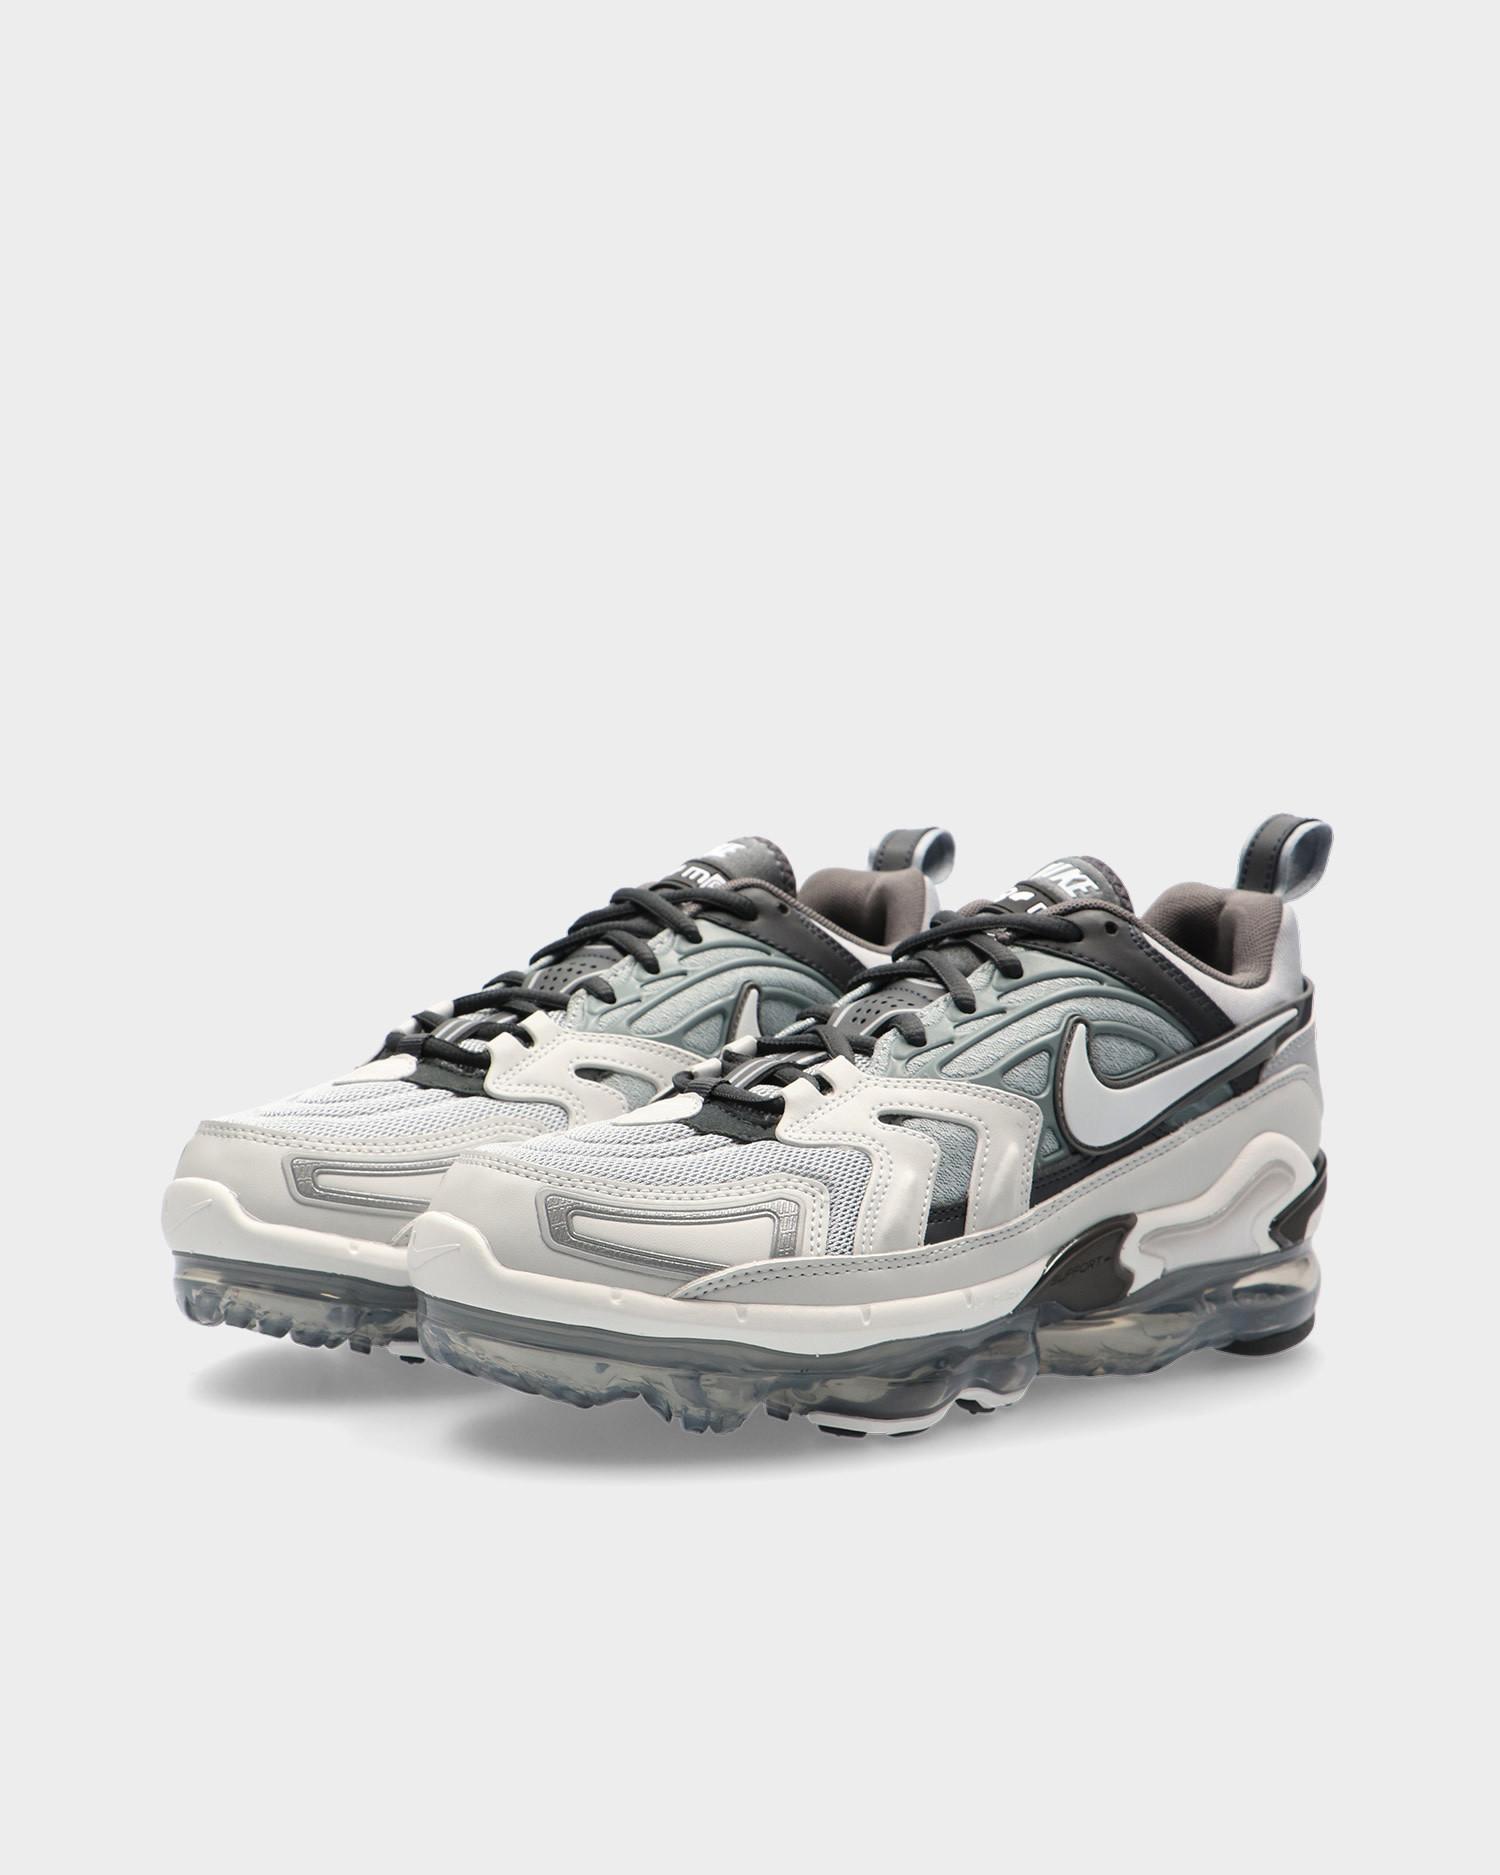 Nike Air VaporMax EVO Wolf grey/White-Anthracite-Dark Grey